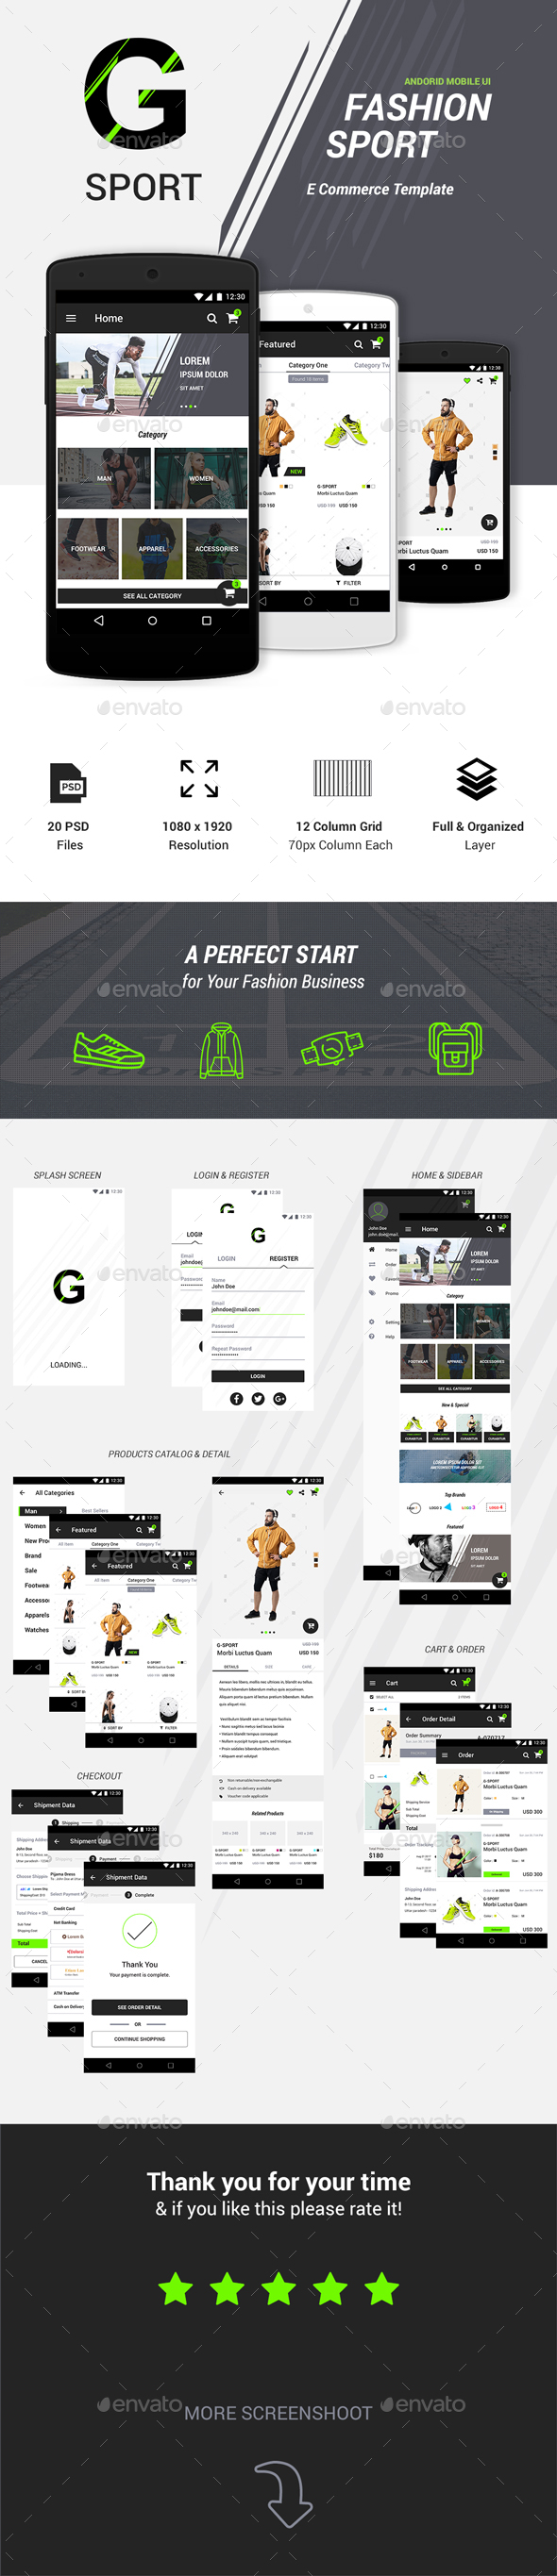 GraphicRiver G-Sport Fashion Ecommerce UI Kit 20565573